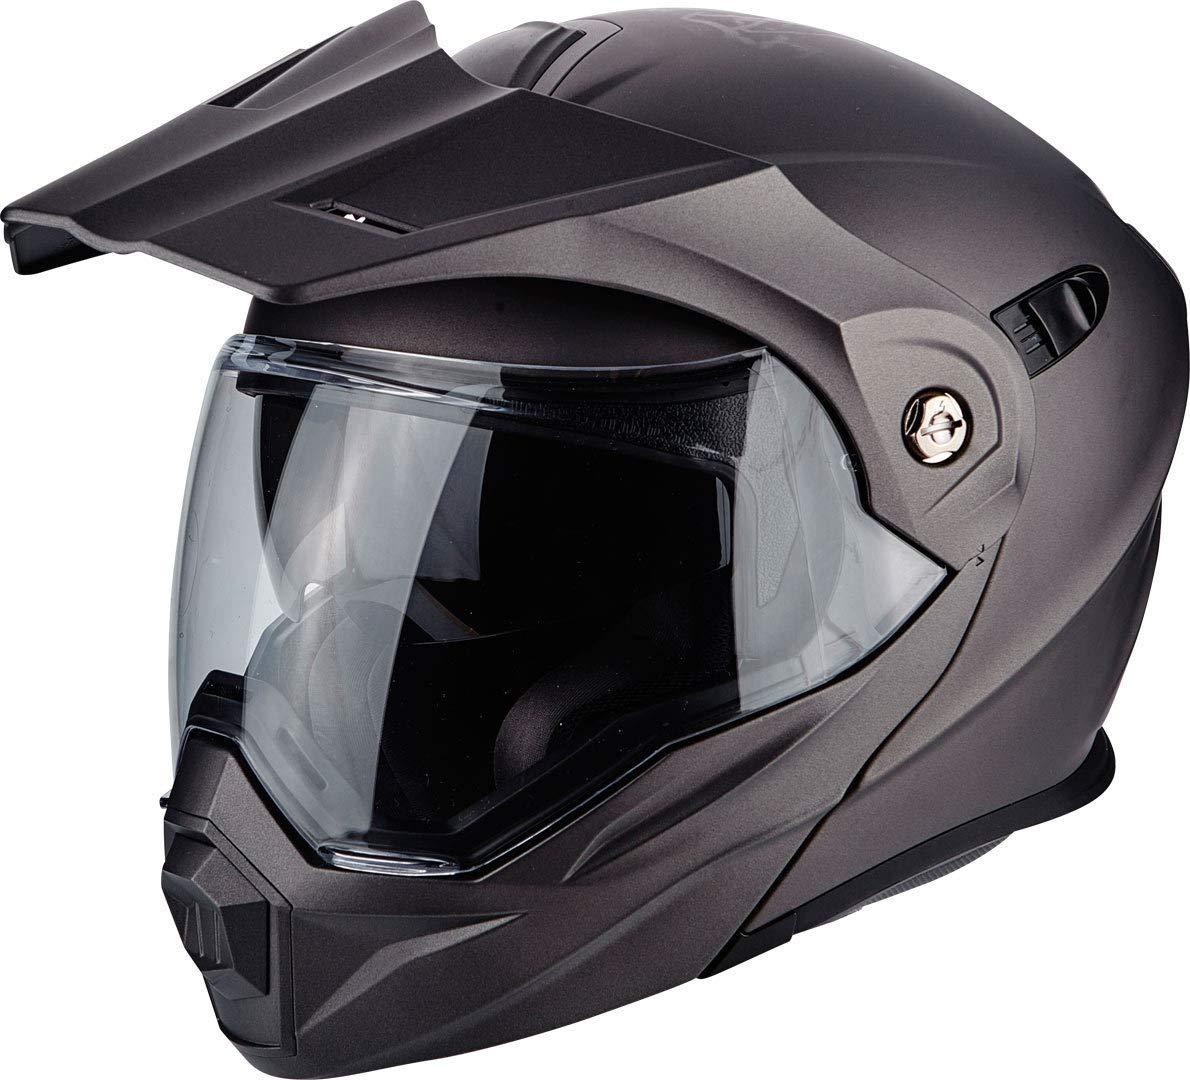 Scorpion ADX 1 SOLID Matt Motorcycle Helmet Black Size L